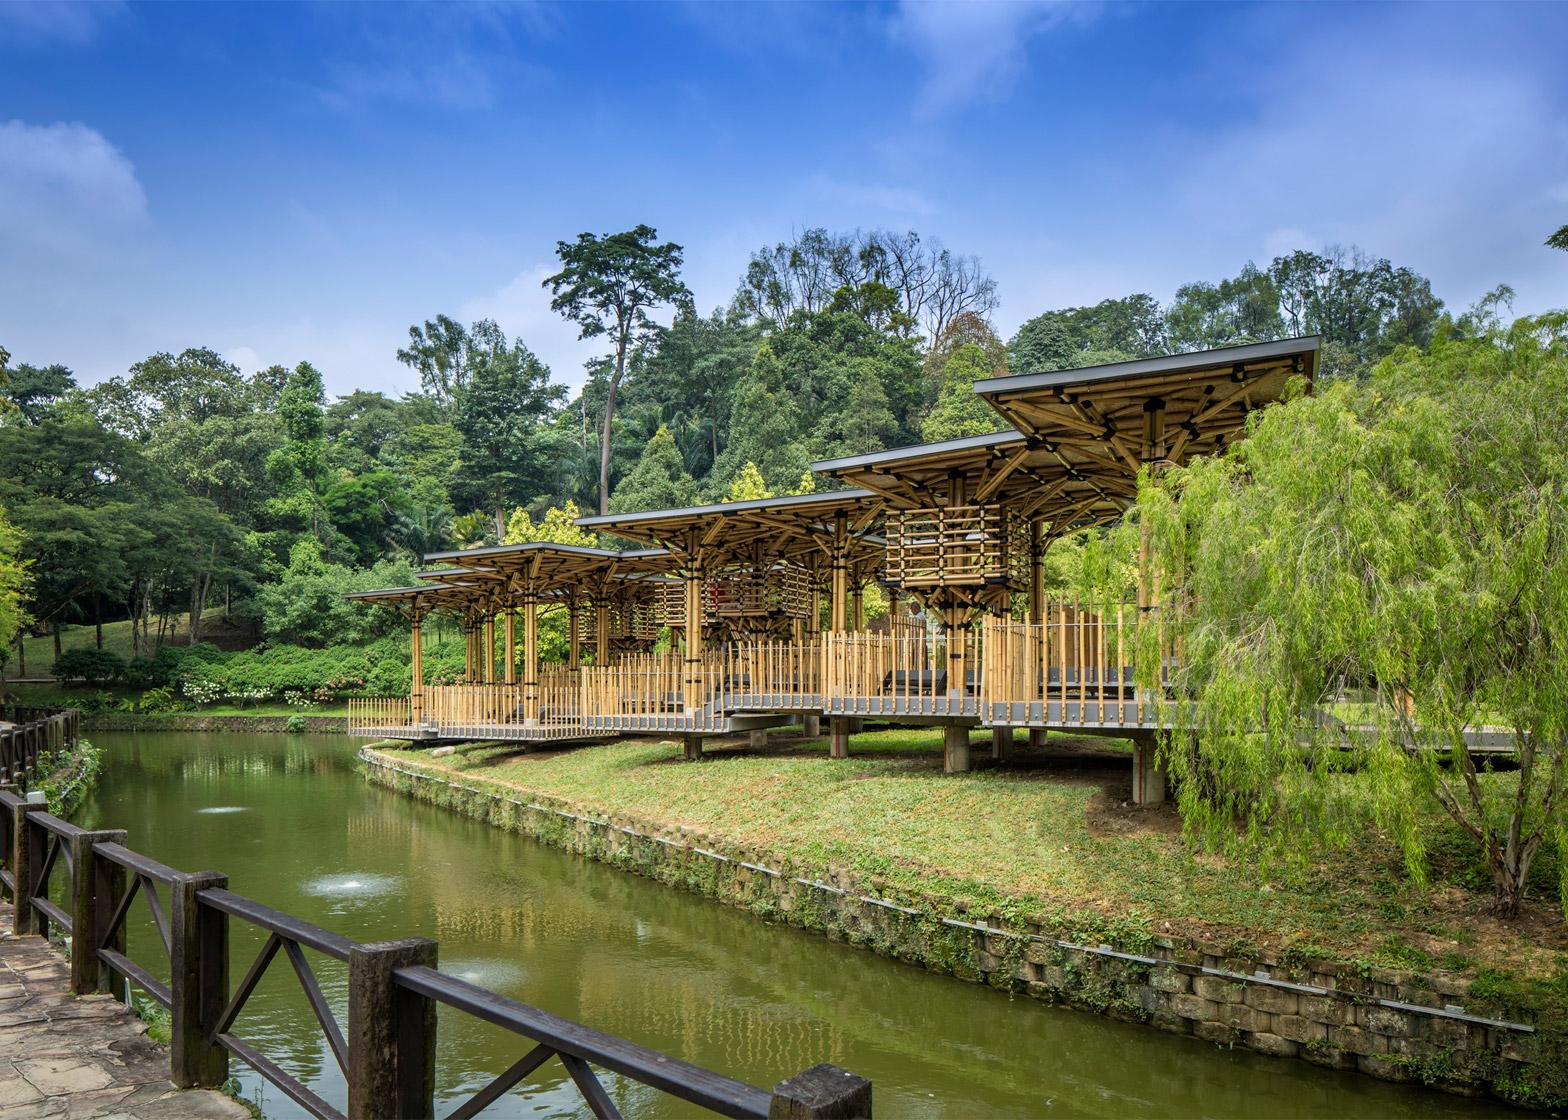 teatro-bambu-eleena-blog-usenatureza